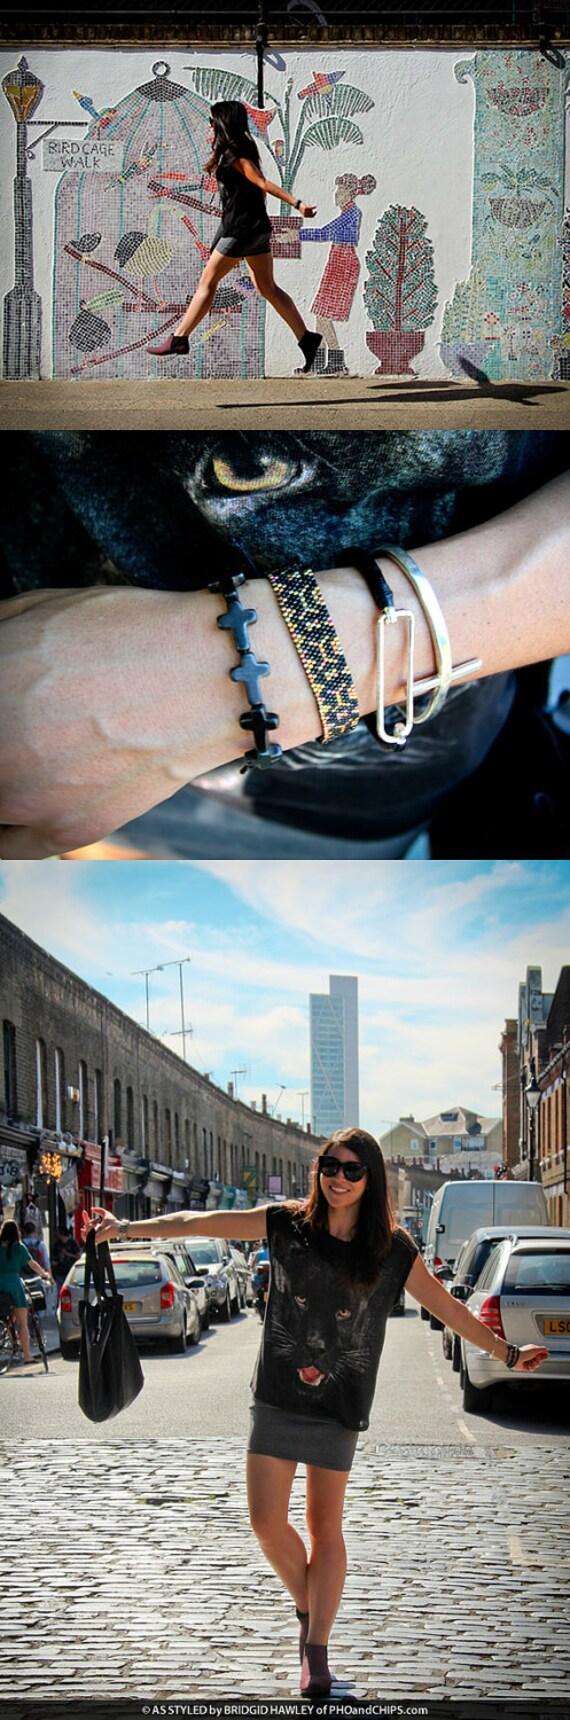 Aztec Black Bracelet, Black Cord Bracelet, Snakeskin Effect Bracelet, Black & Gold Bracelet, OOAK Handmade by JeannieRichard